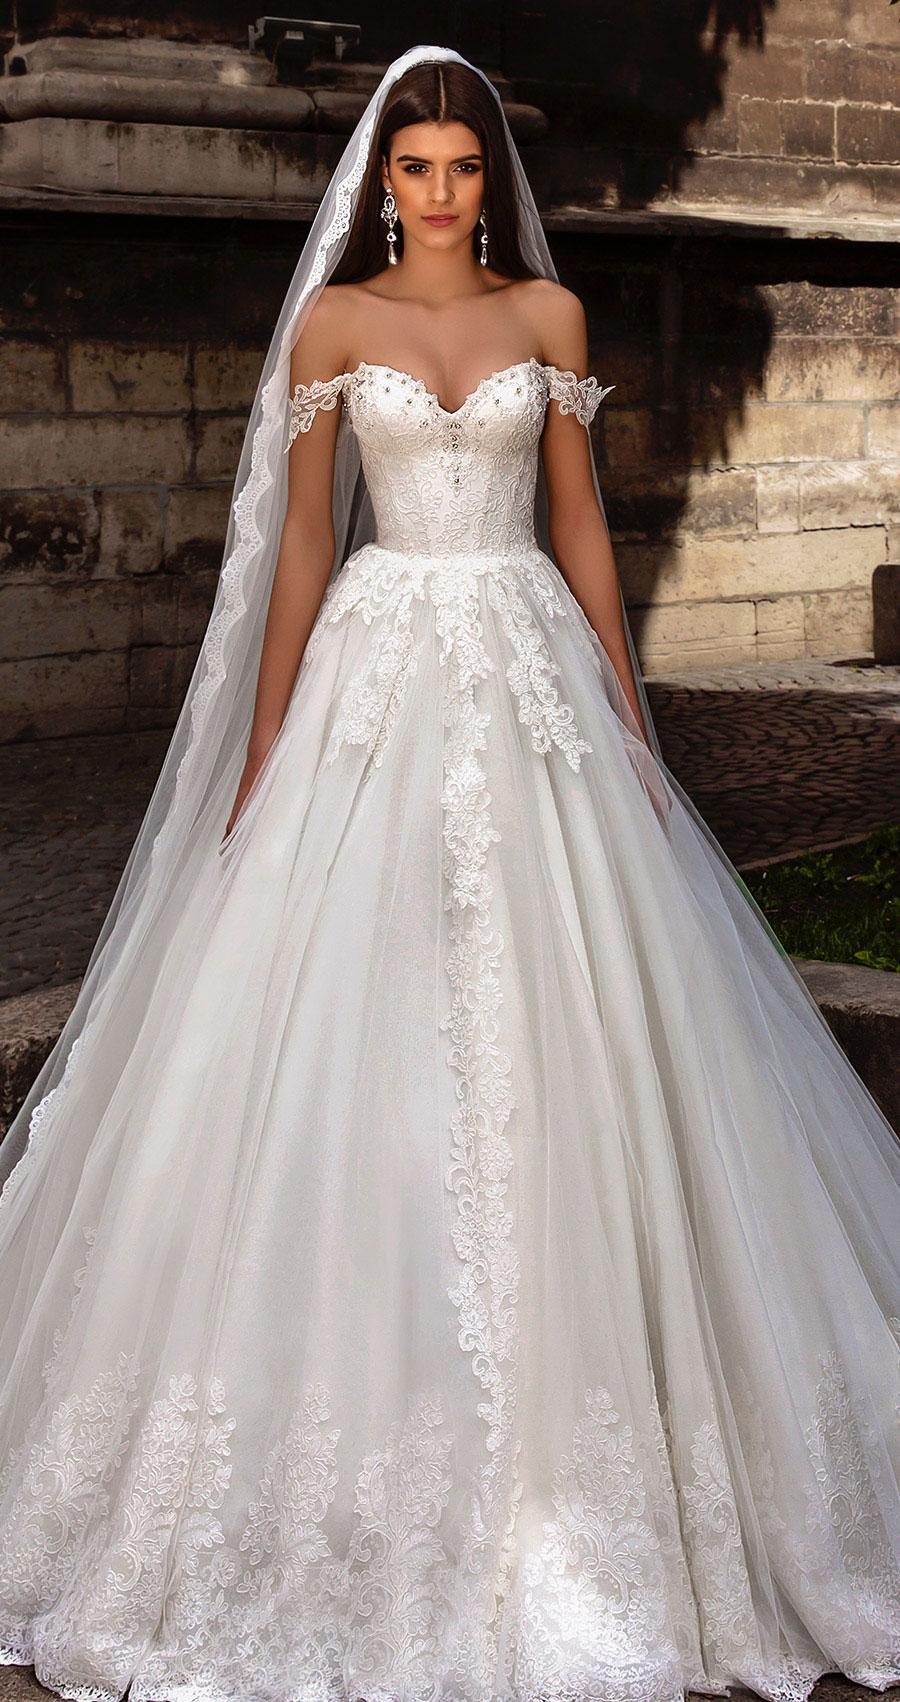 Busty Wedding Dresses